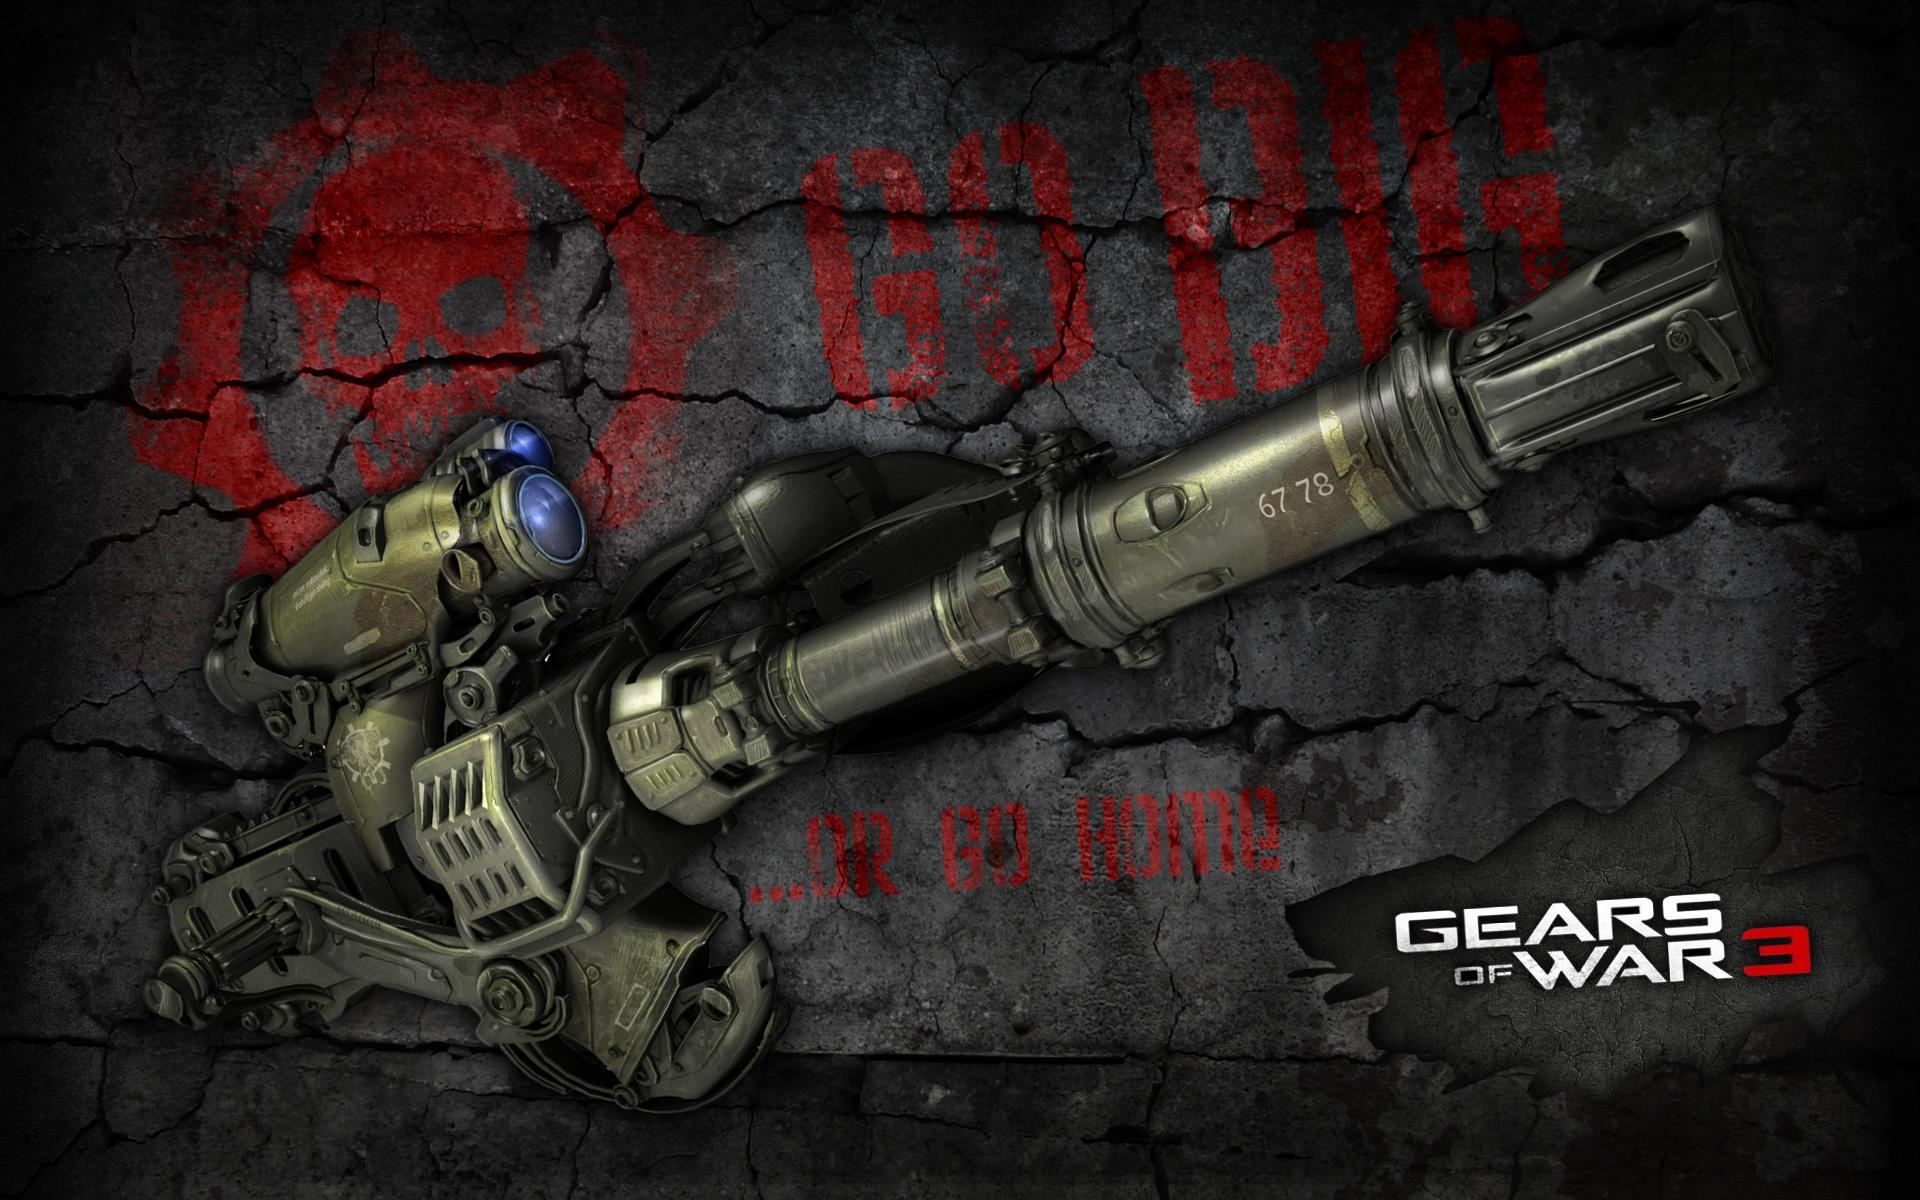 Gears Of War 3 wallpaper   738451 1920x1200